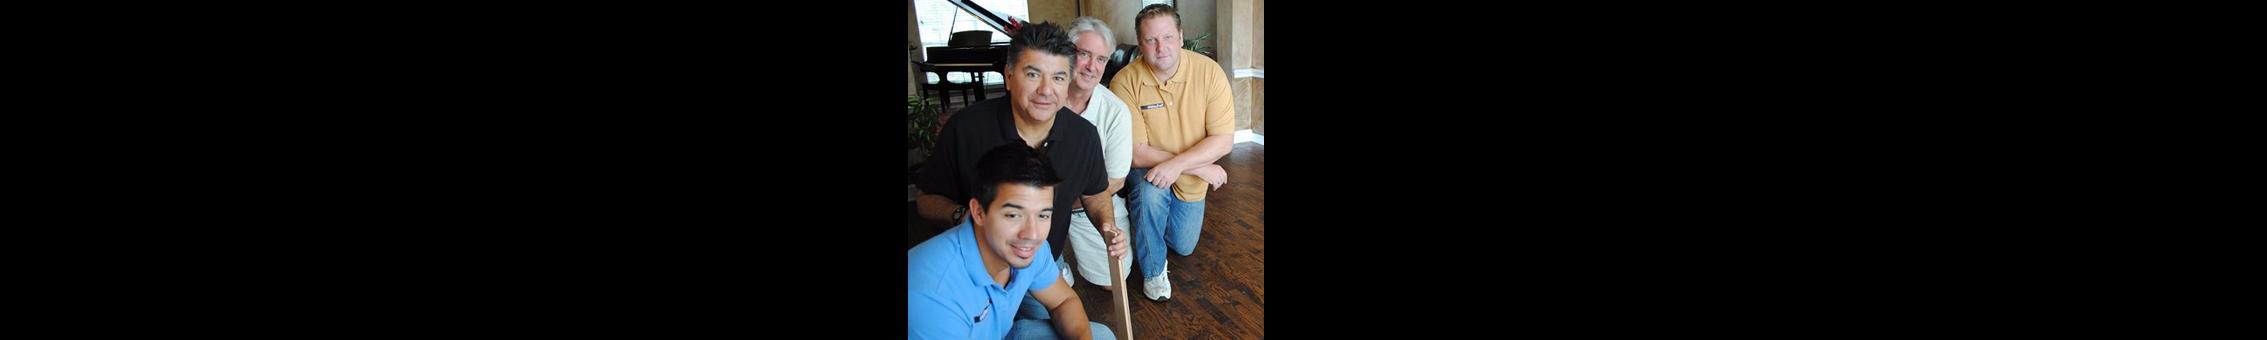 Texas Hardwood Flooring Inc Dallas Tx 75207 Networx